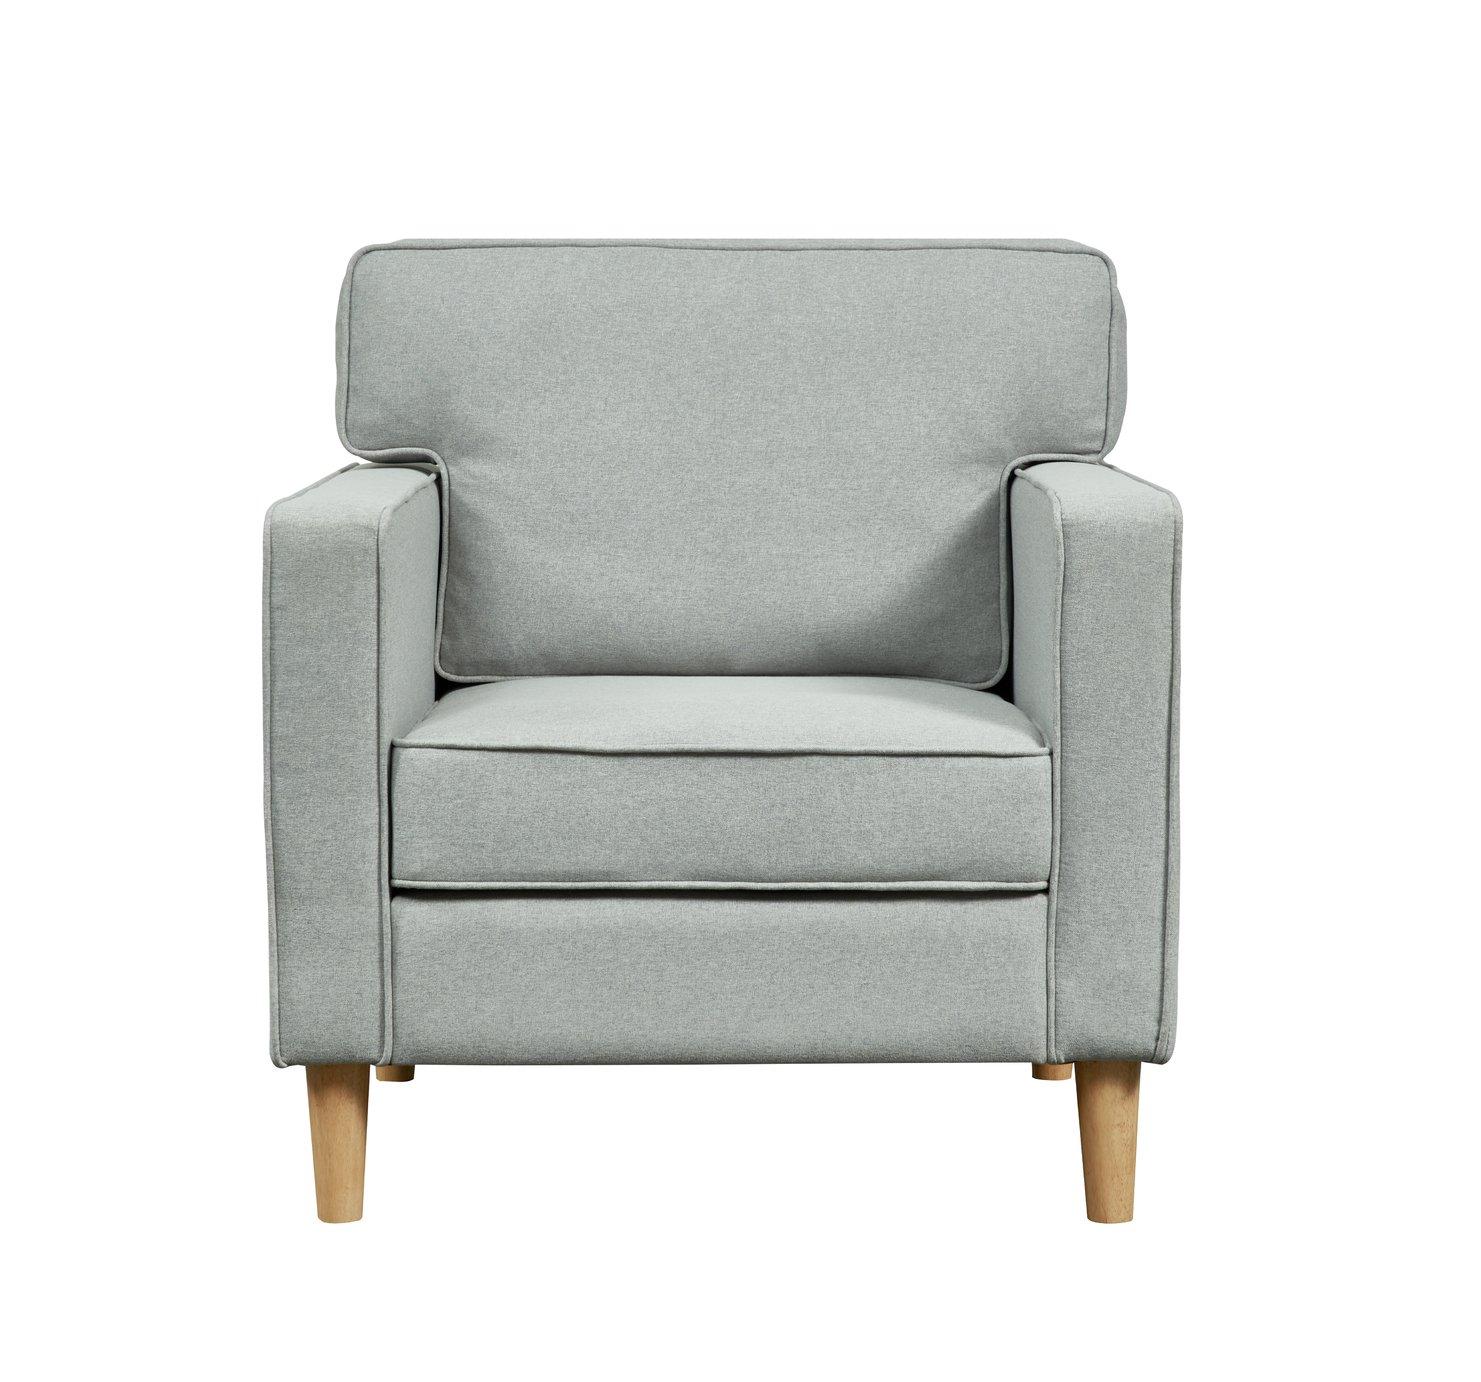 Argos Home Christopher Fabric Armchair - Grey